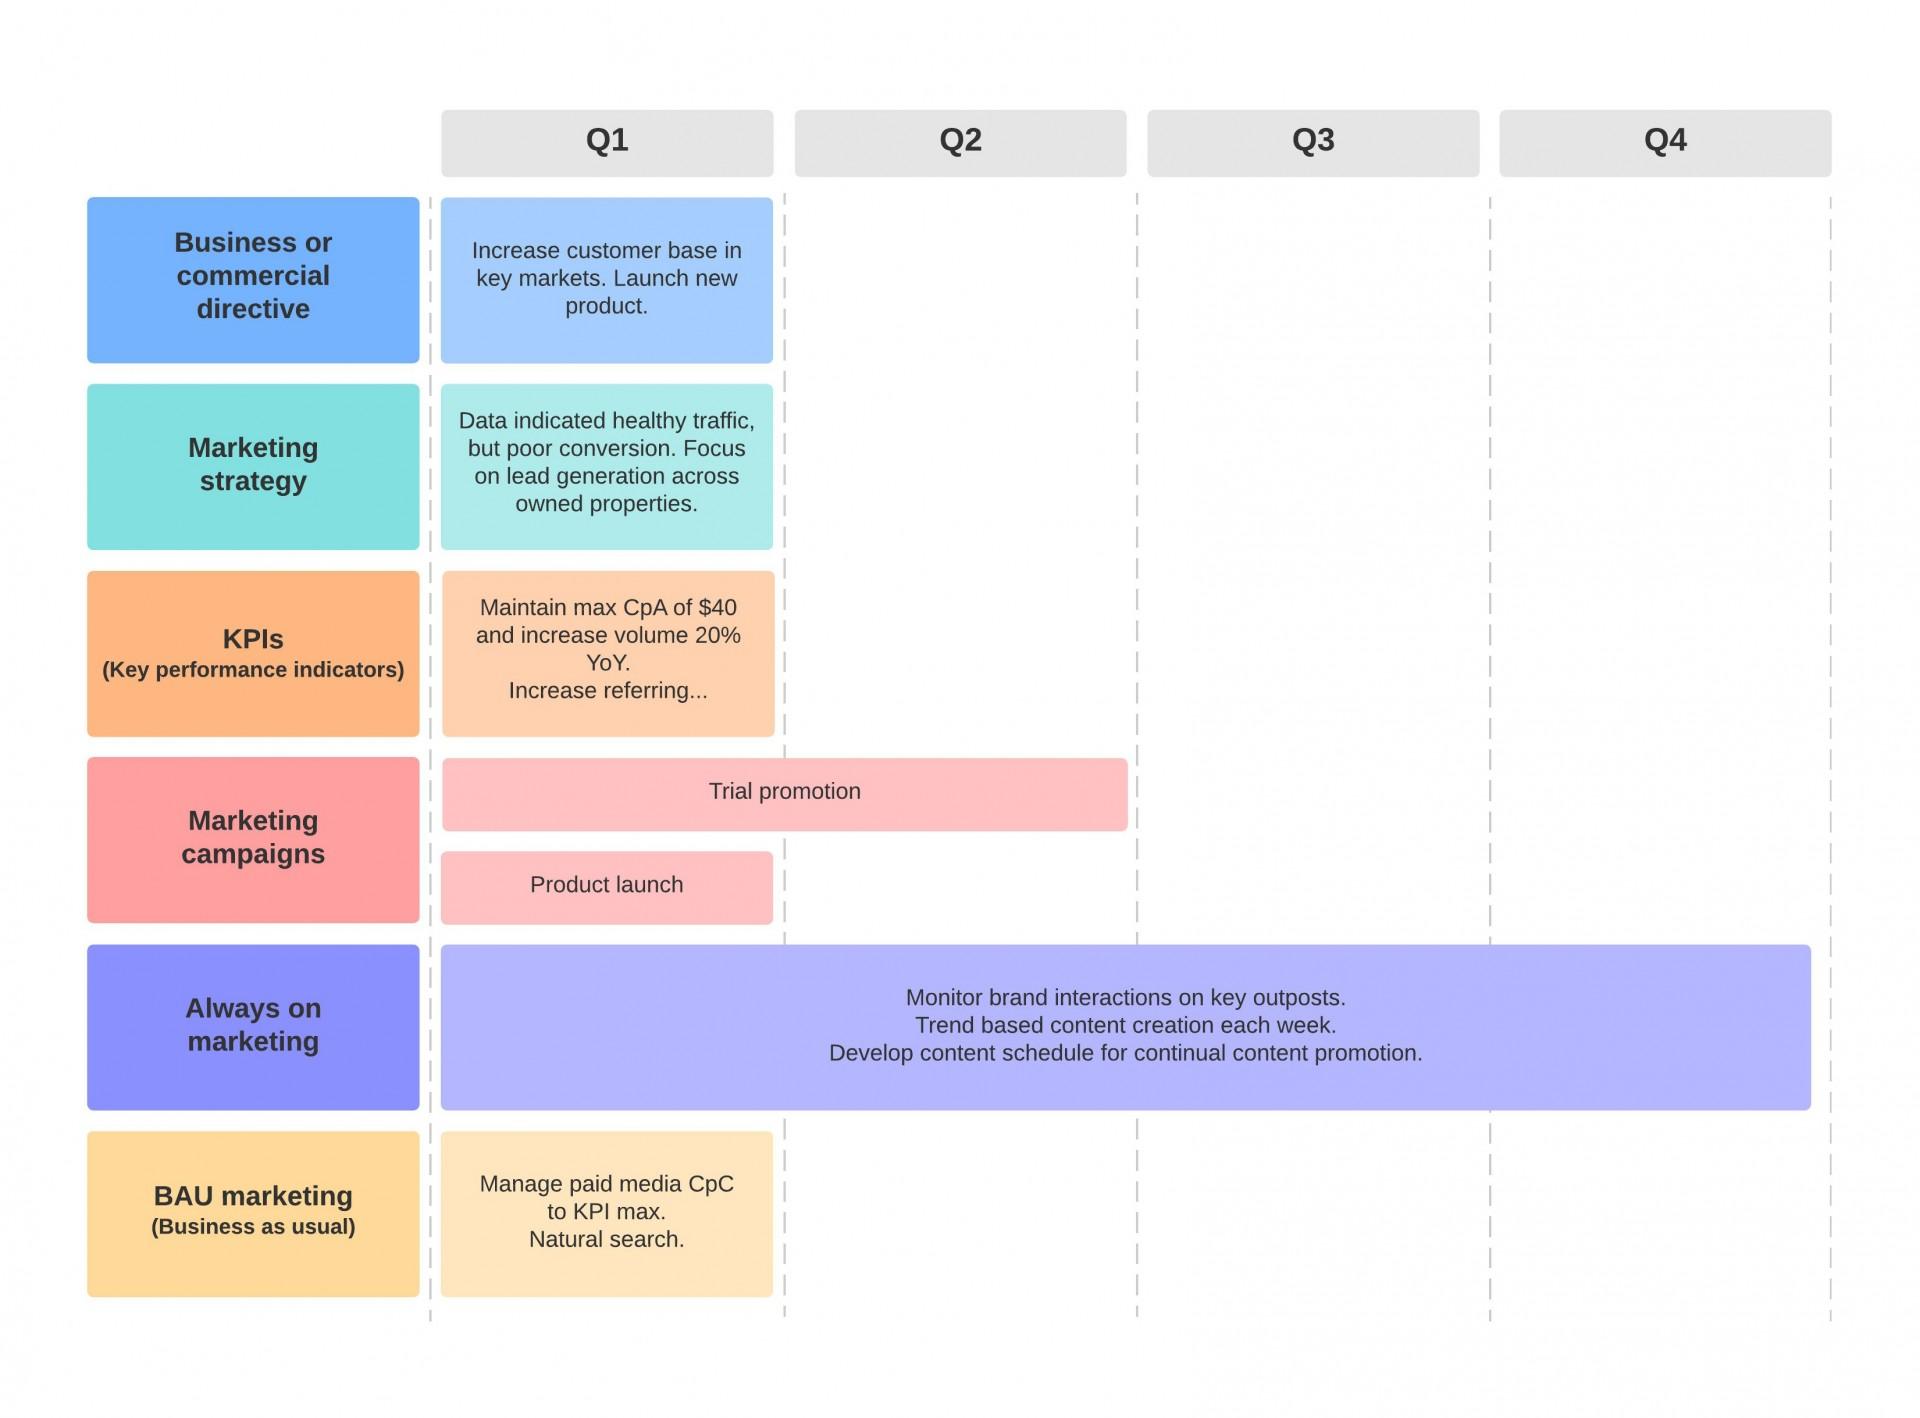 008 Stunning Digital Marketing Plan Template Concept  .xl Doc1920